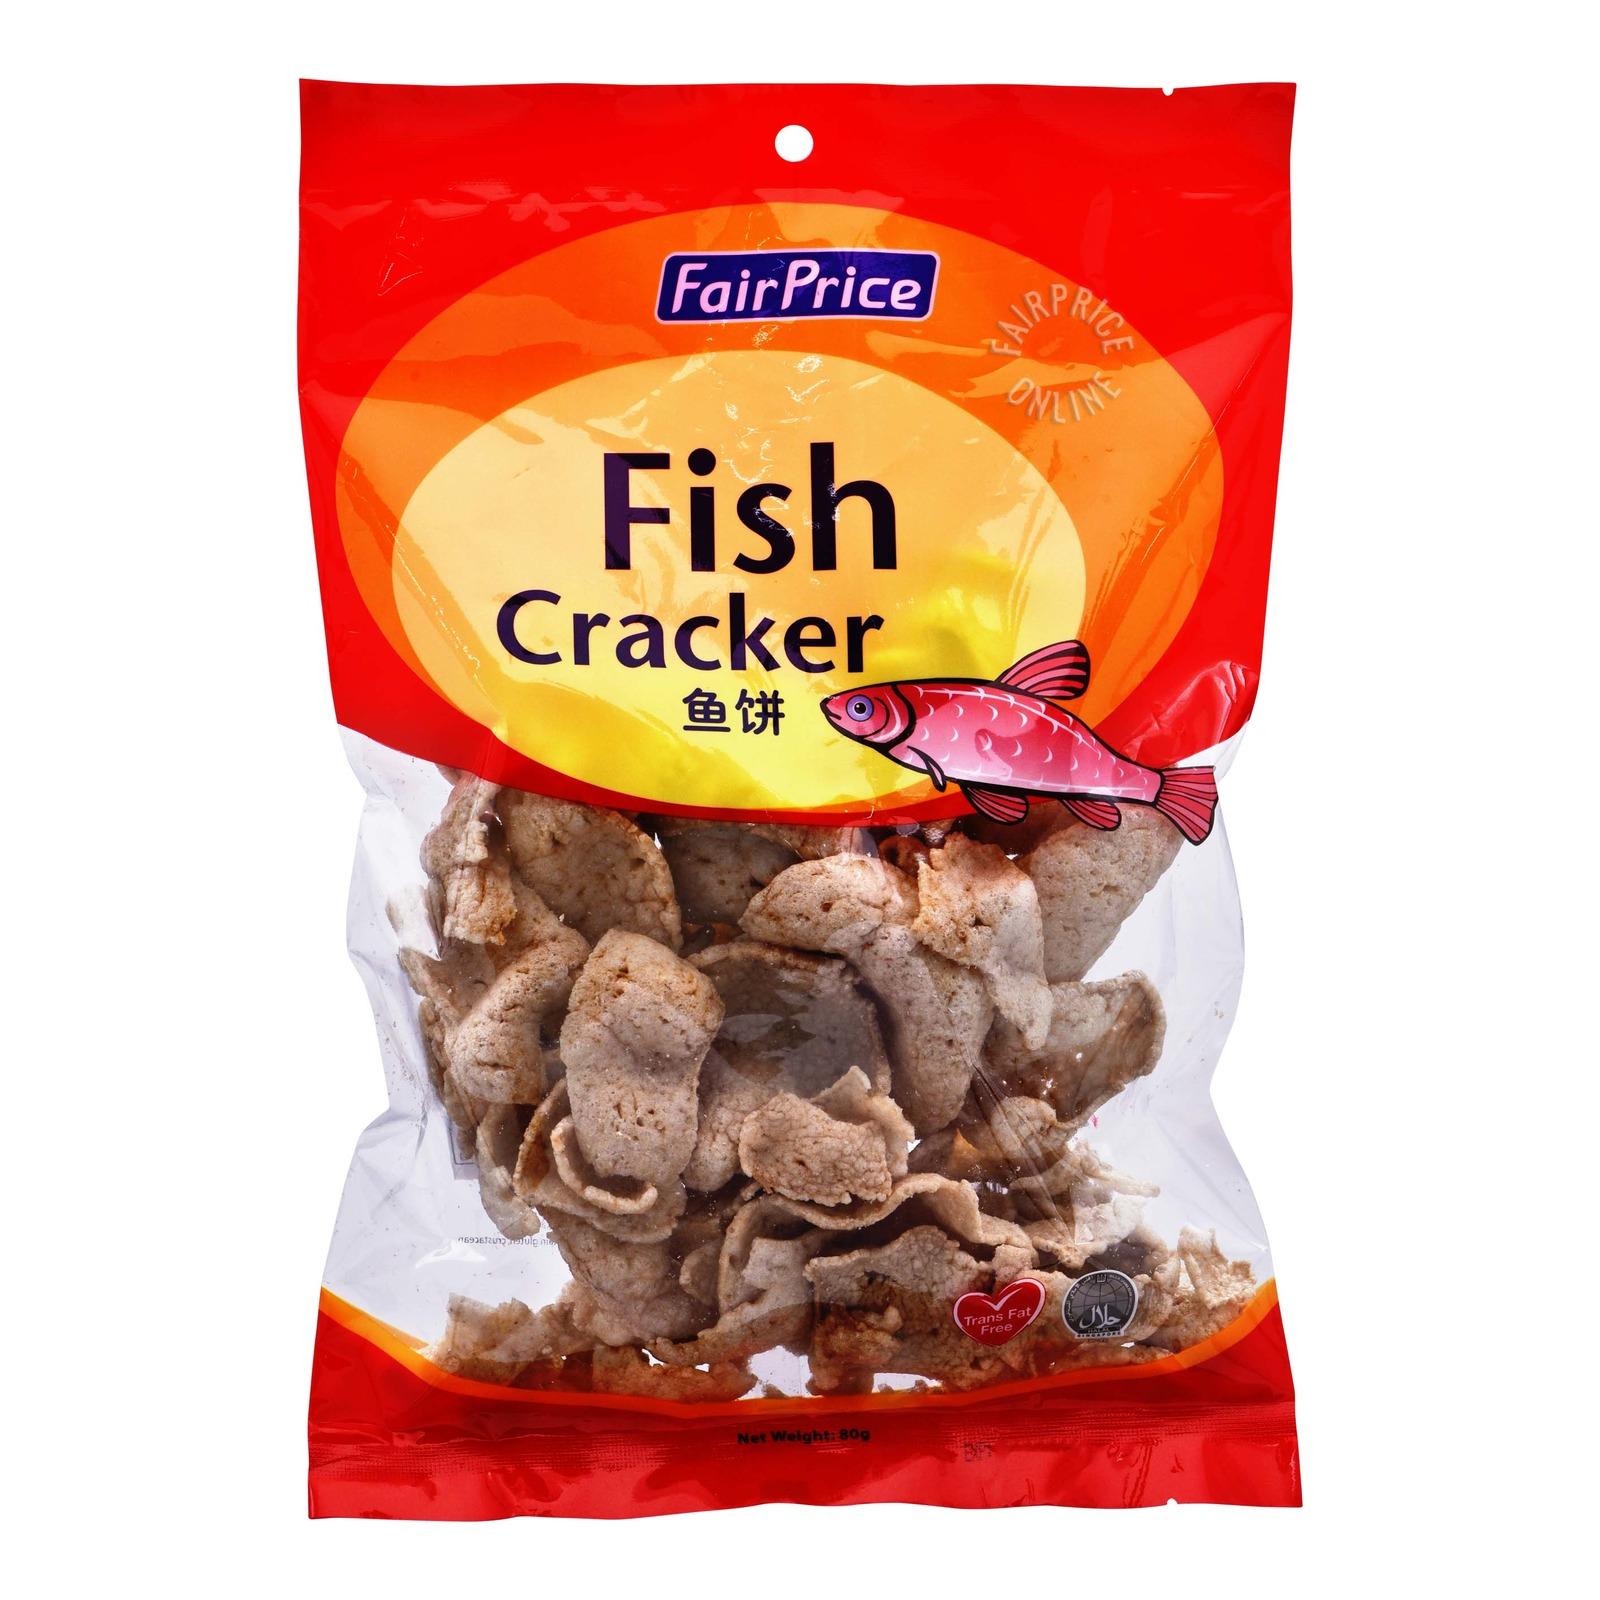 FairPrice Crackers - Fish